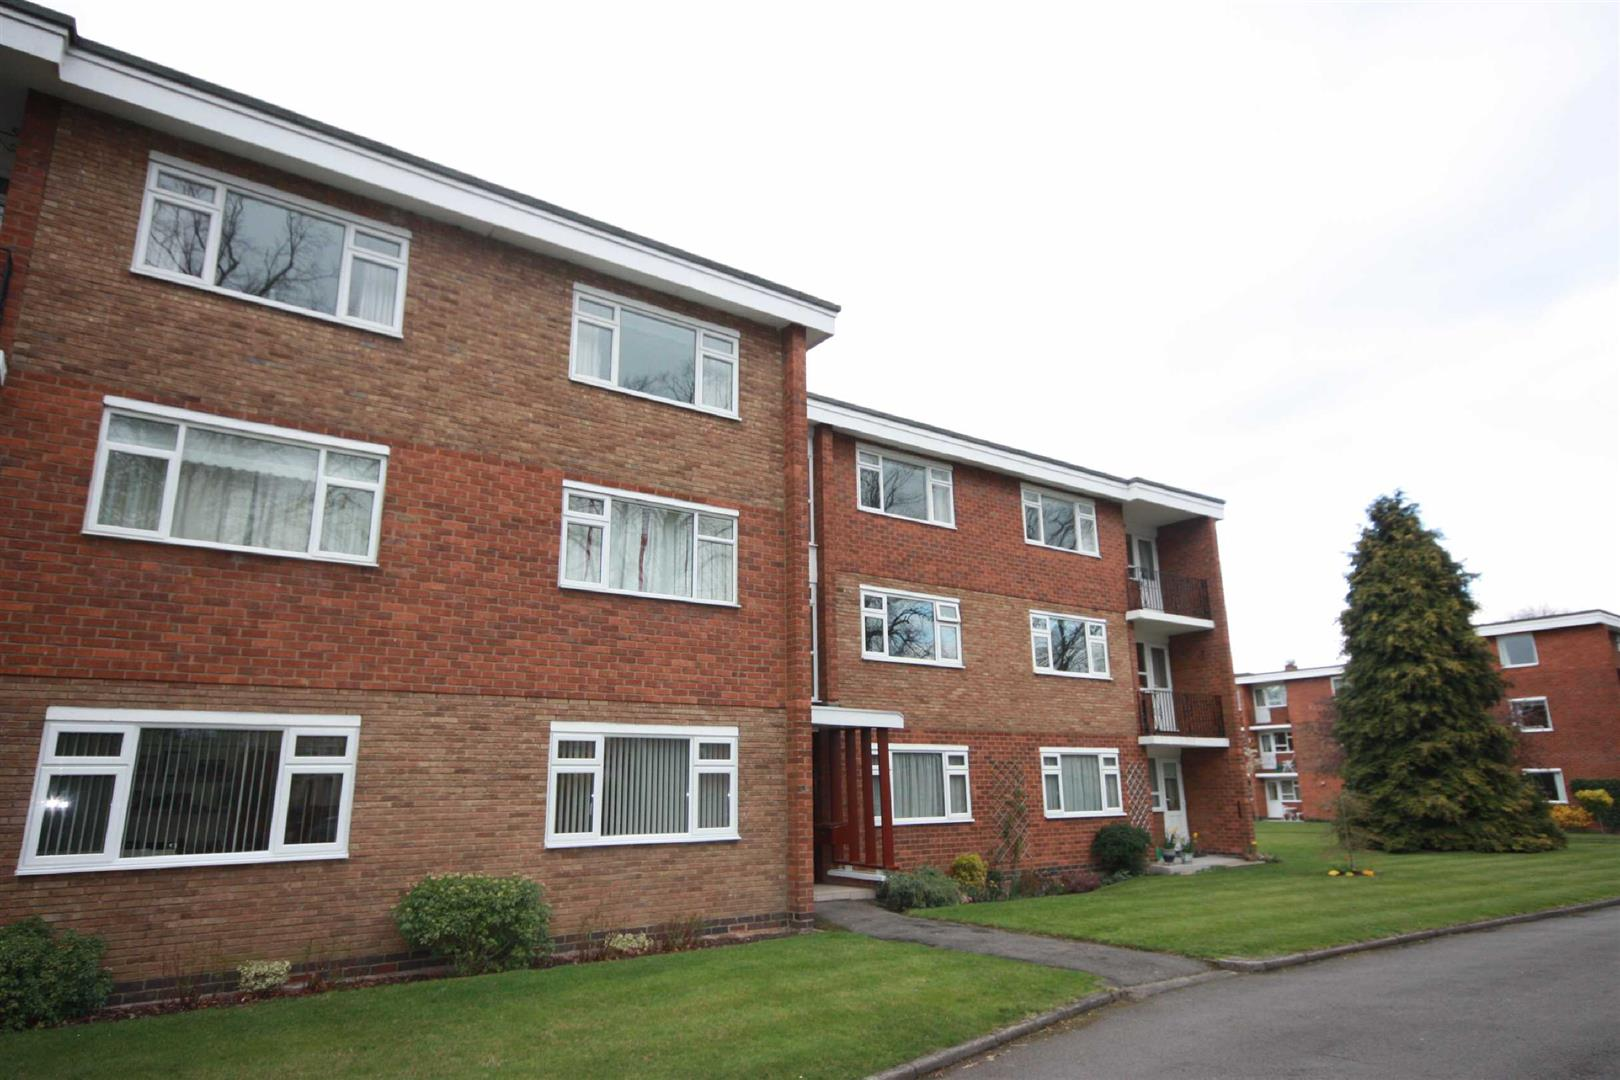 Brookhurst Court, Leamington Spa, CV32